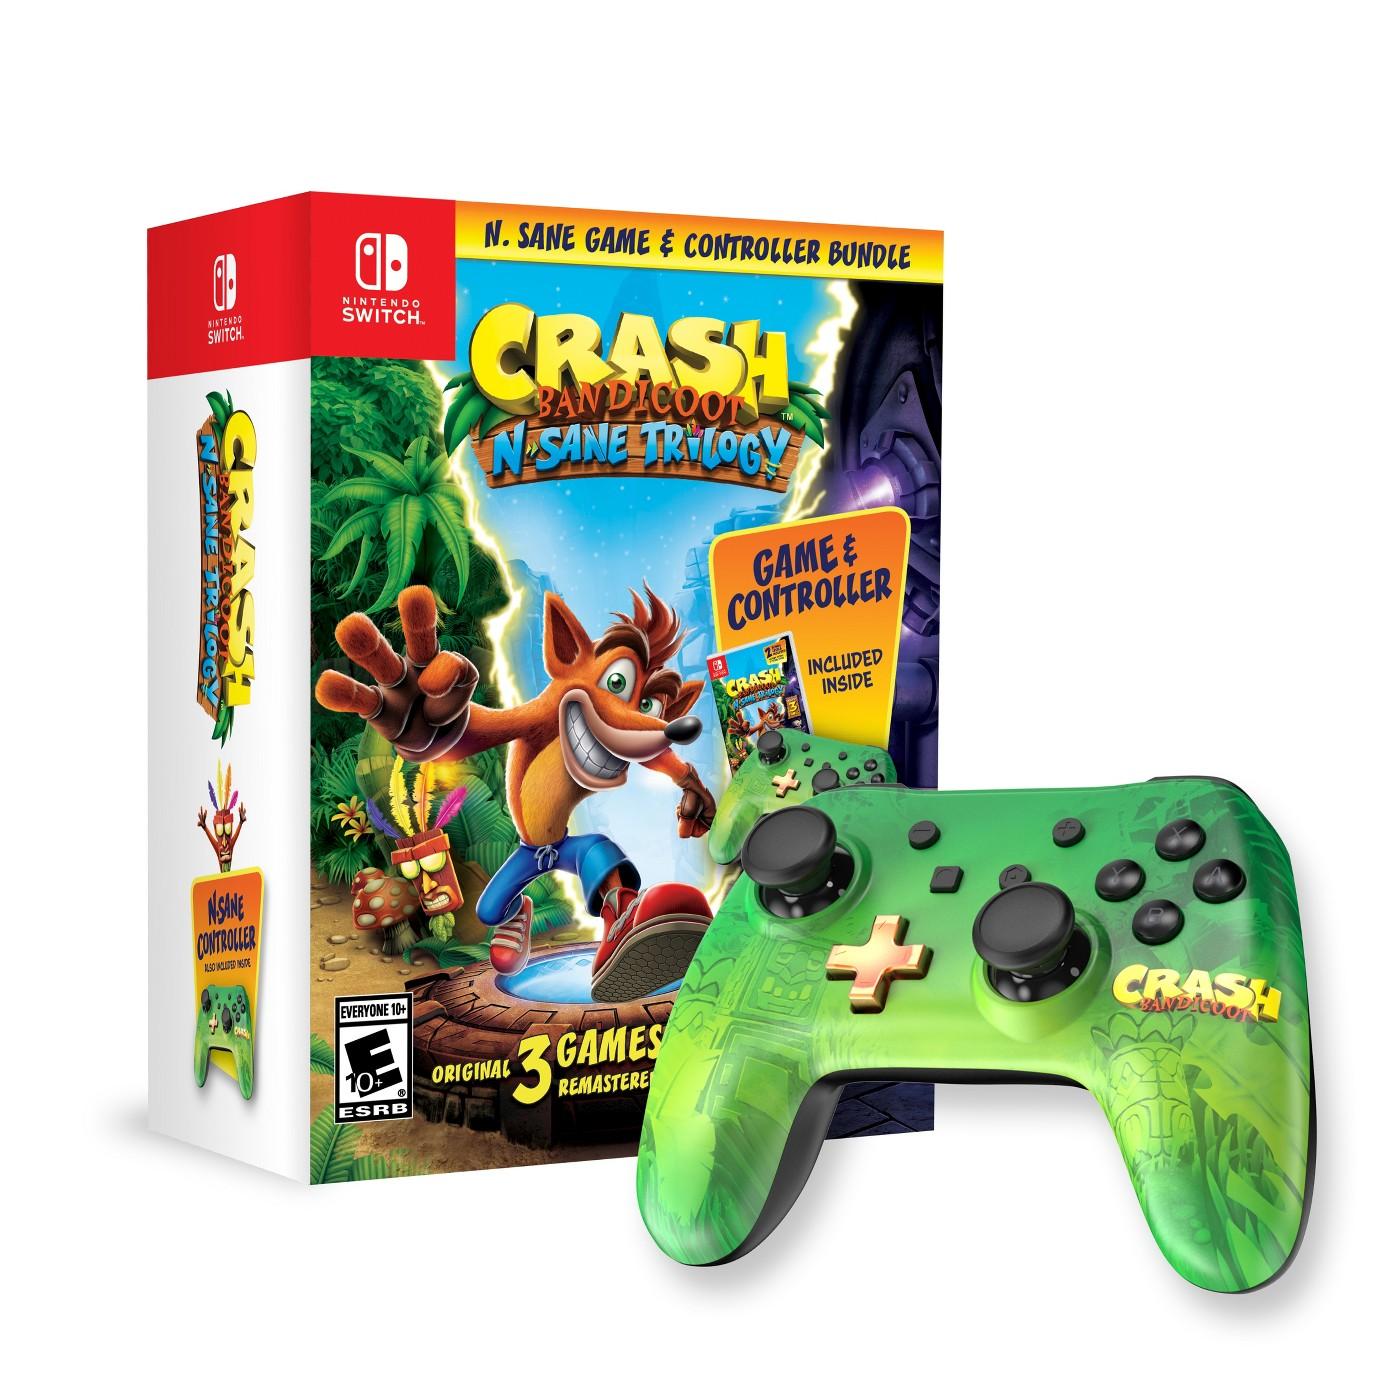 Crash Bandicoot: N. Sane Trilogy Bundle - Nintendo Switch - image 1 of 10